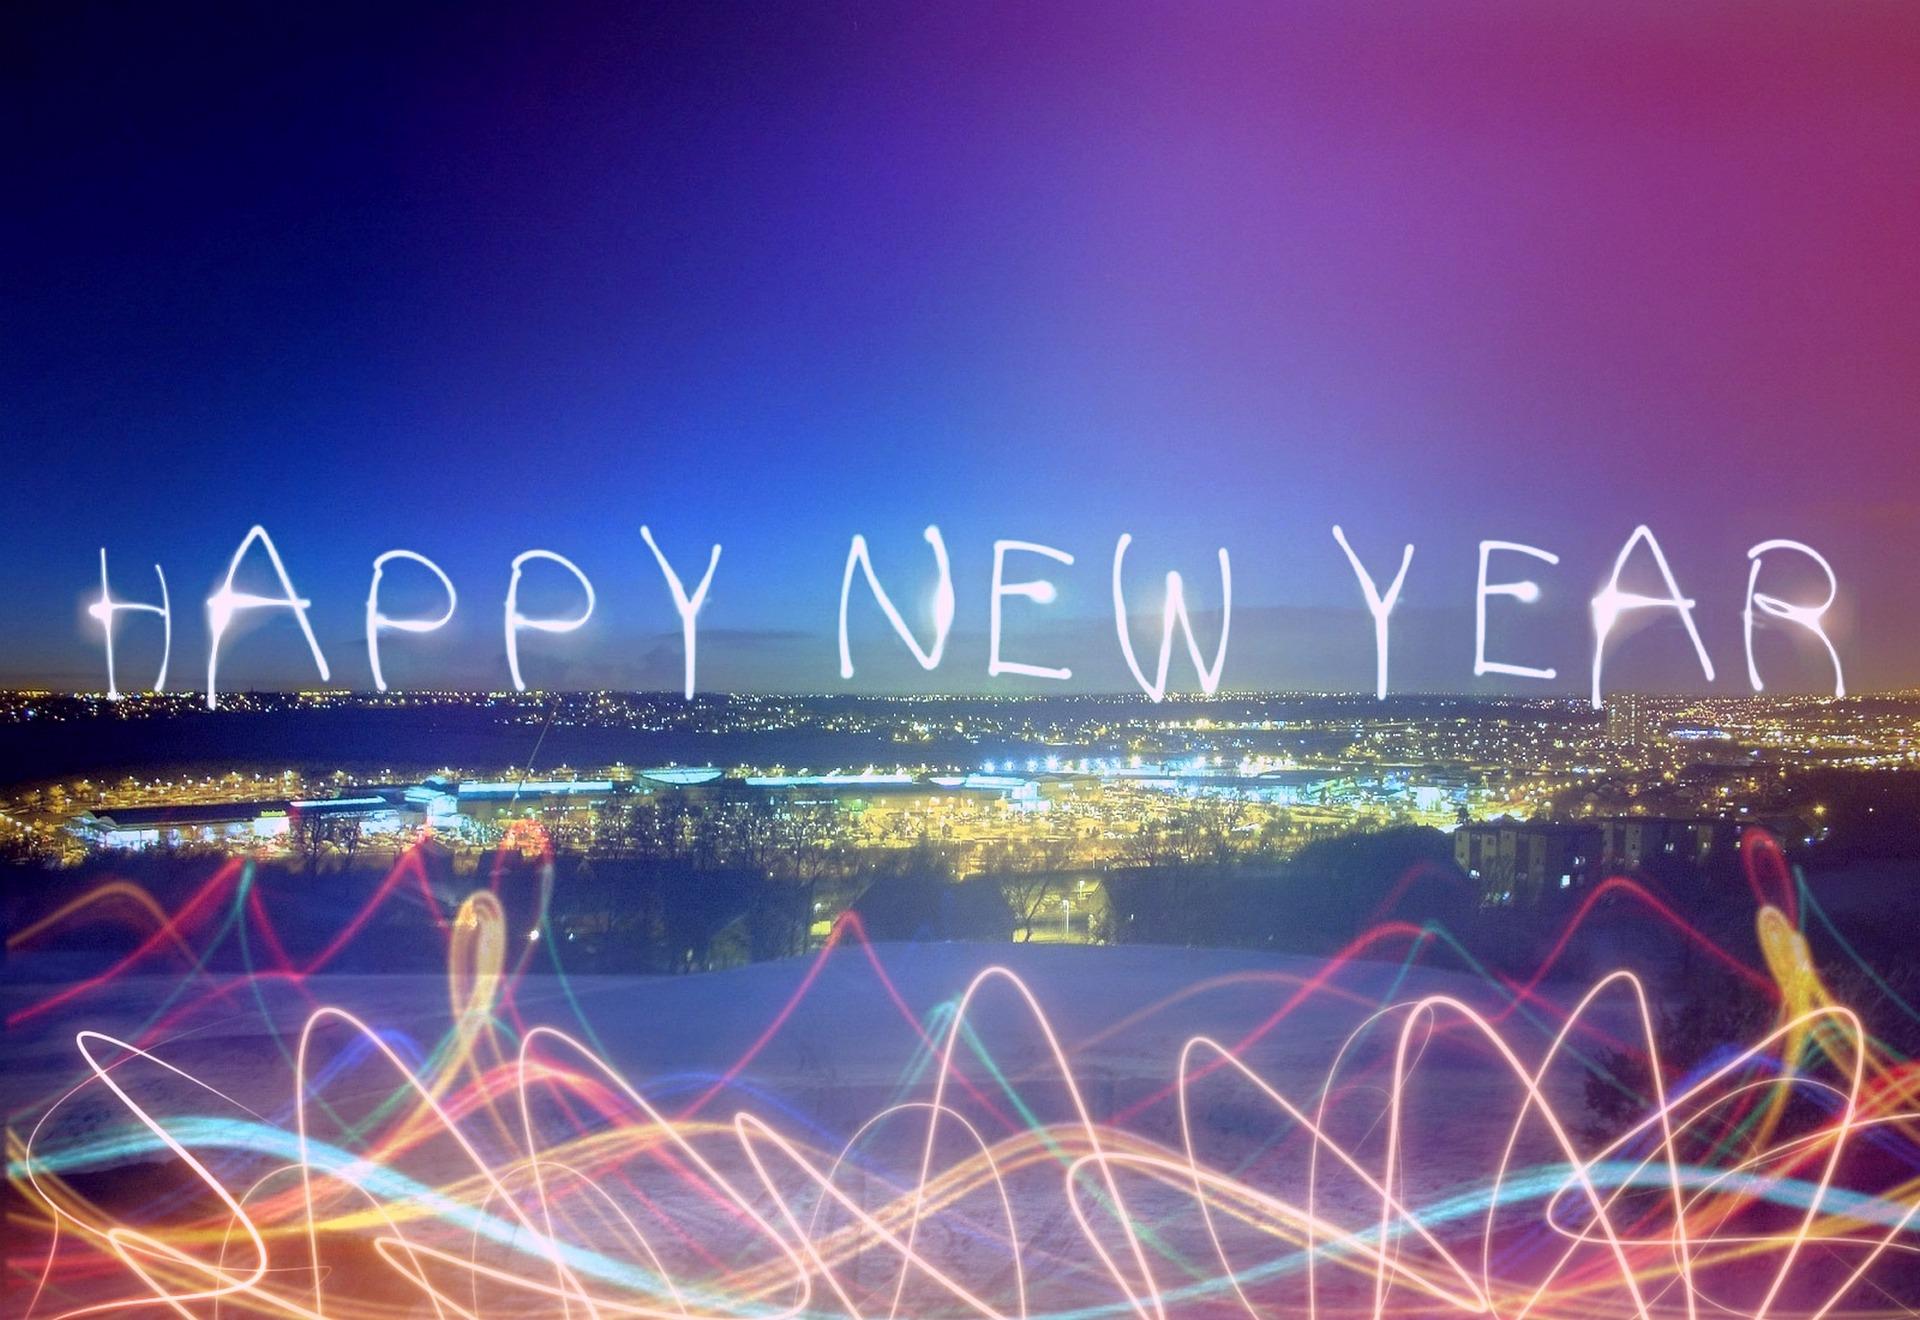 happy-new-year-1063797_1920.jpg